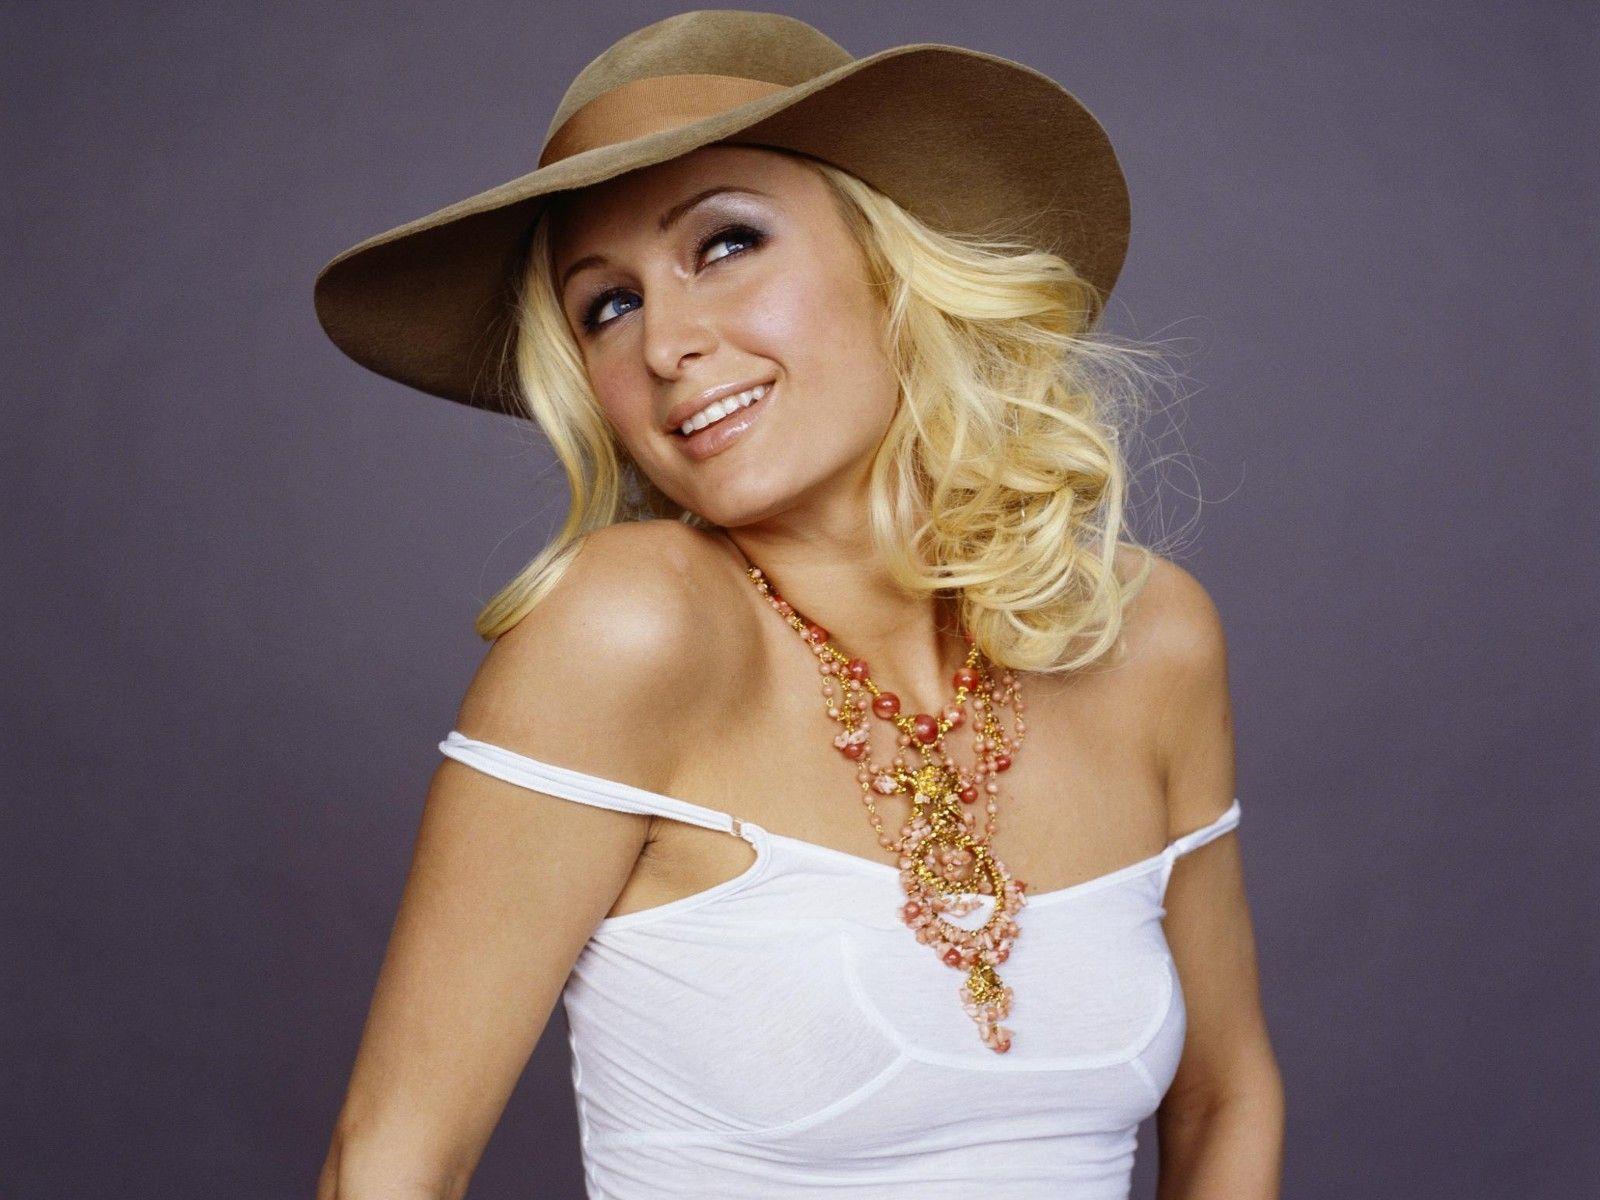 Paris Hilton Sexy Video